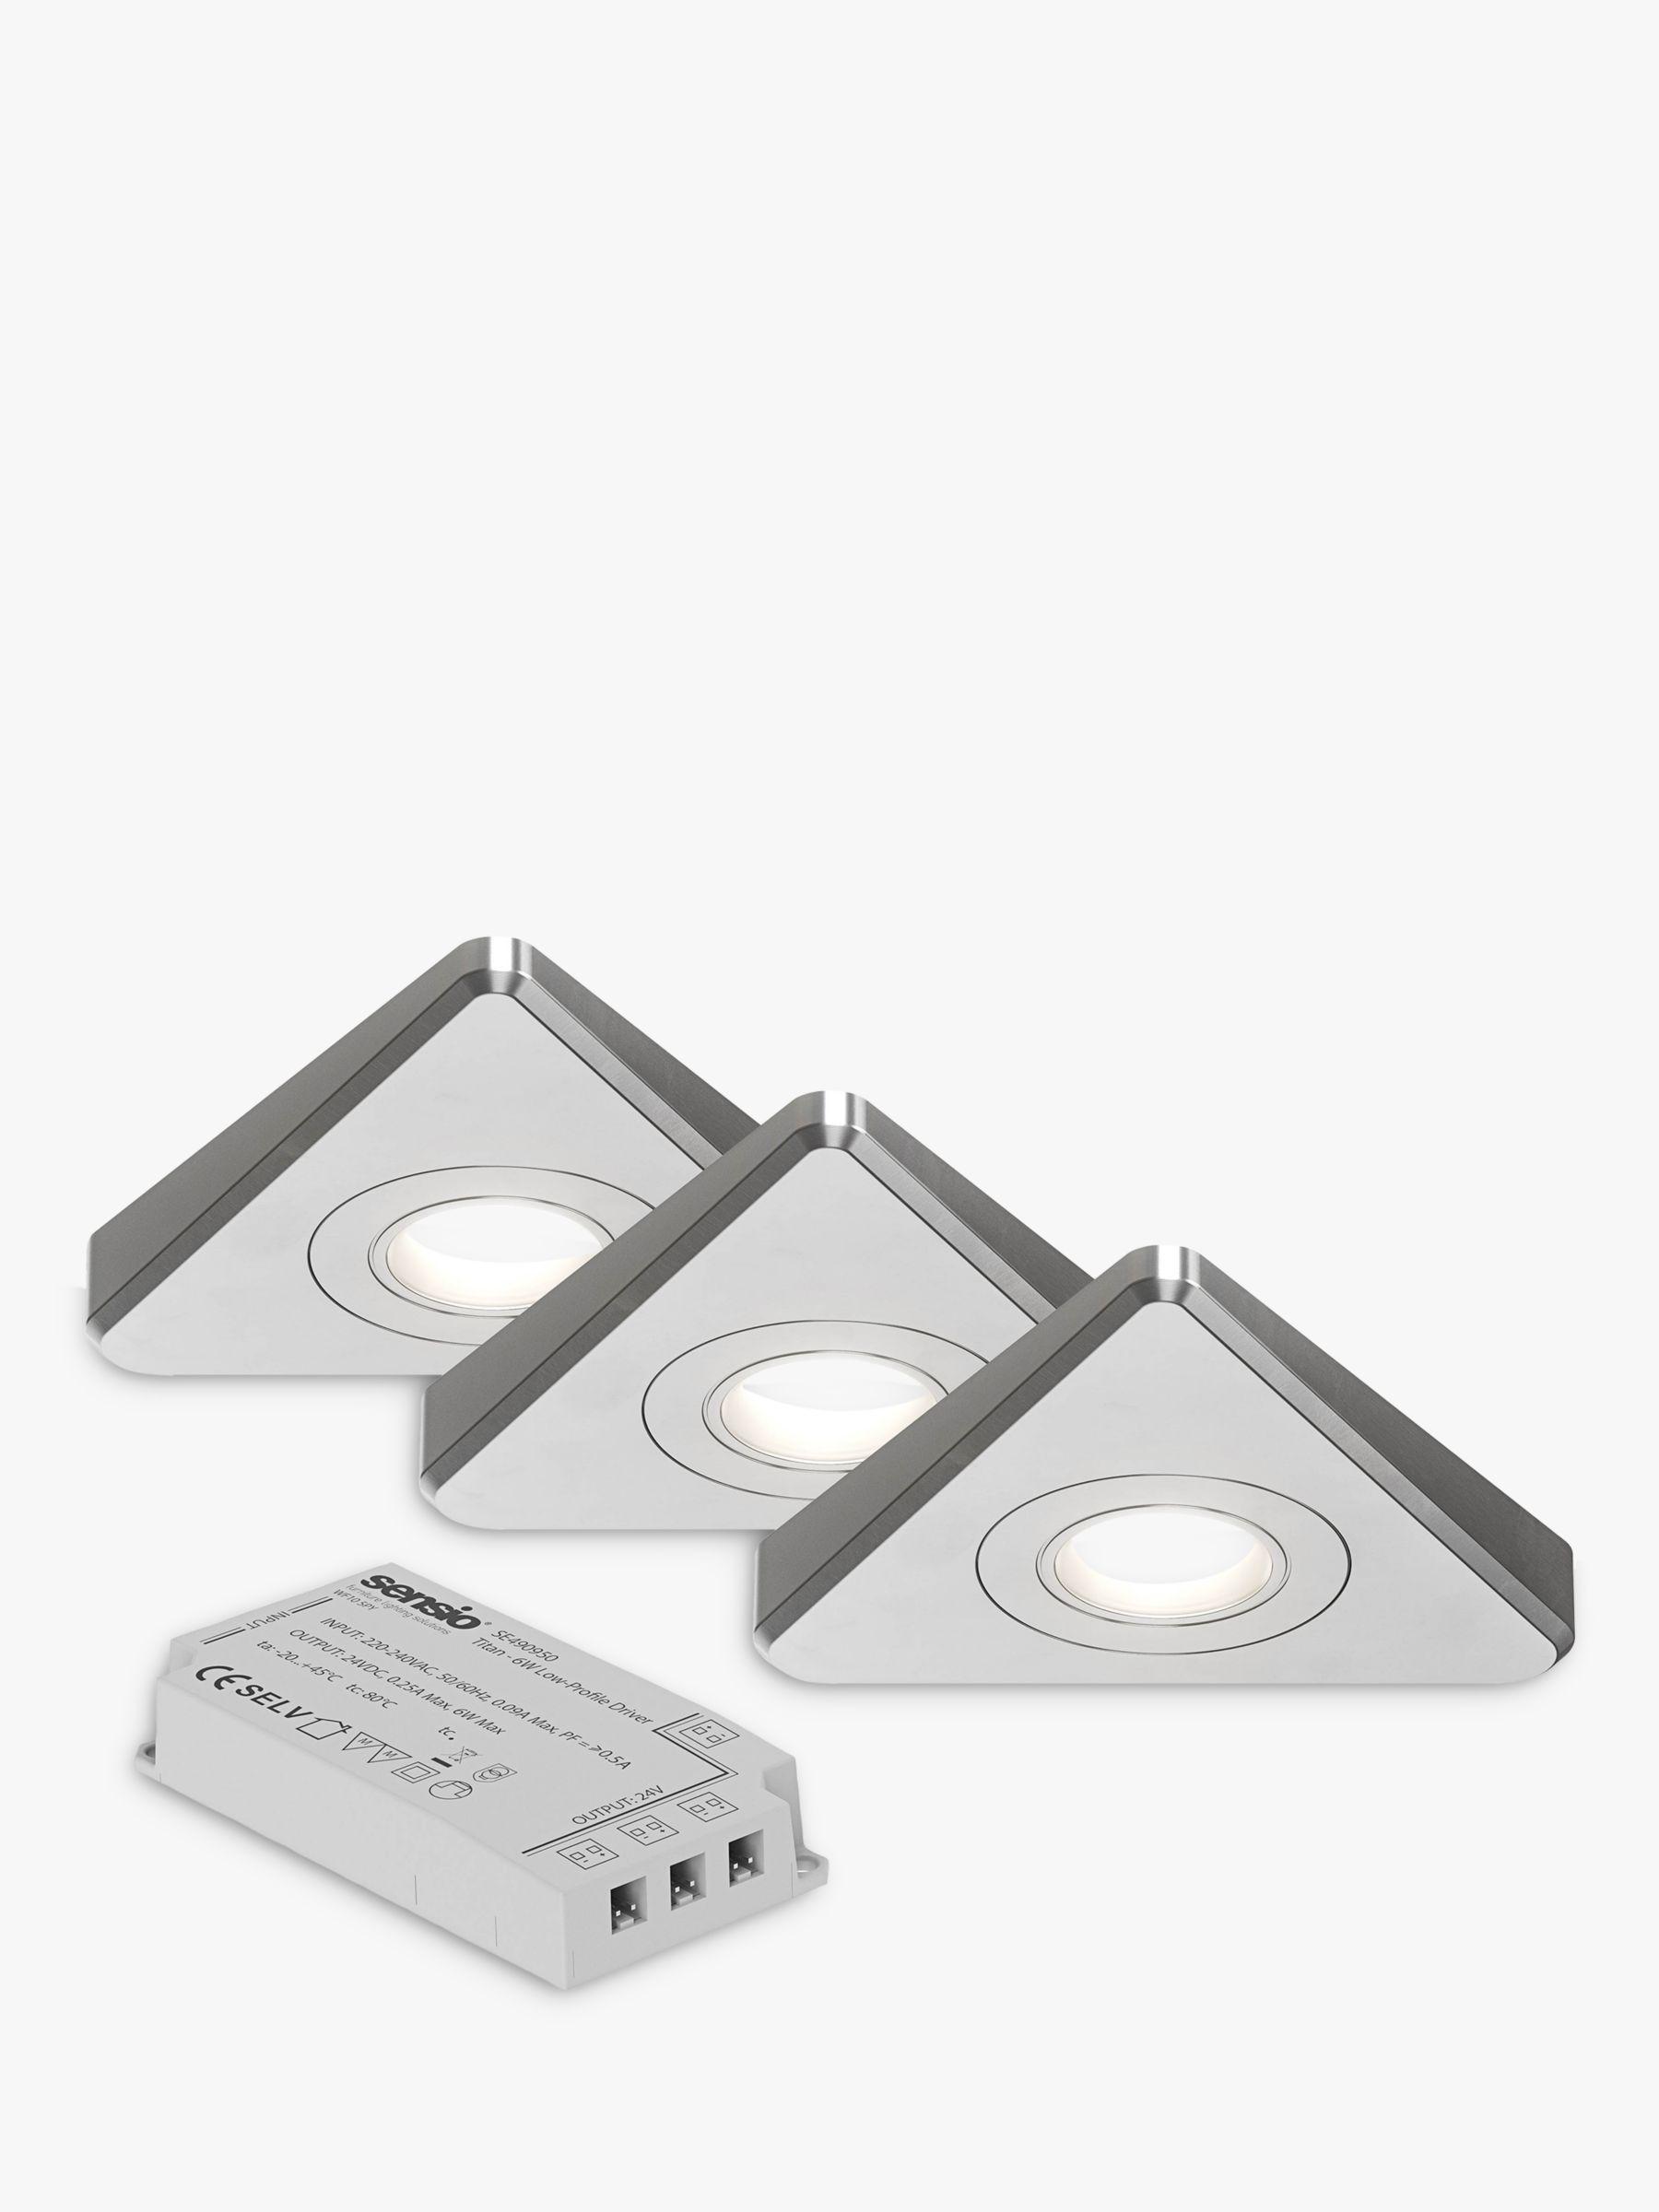 Sensio Nexus LED Trio Tone Under Kitchen Cabinet Lights & Driver, Pack of 3, White